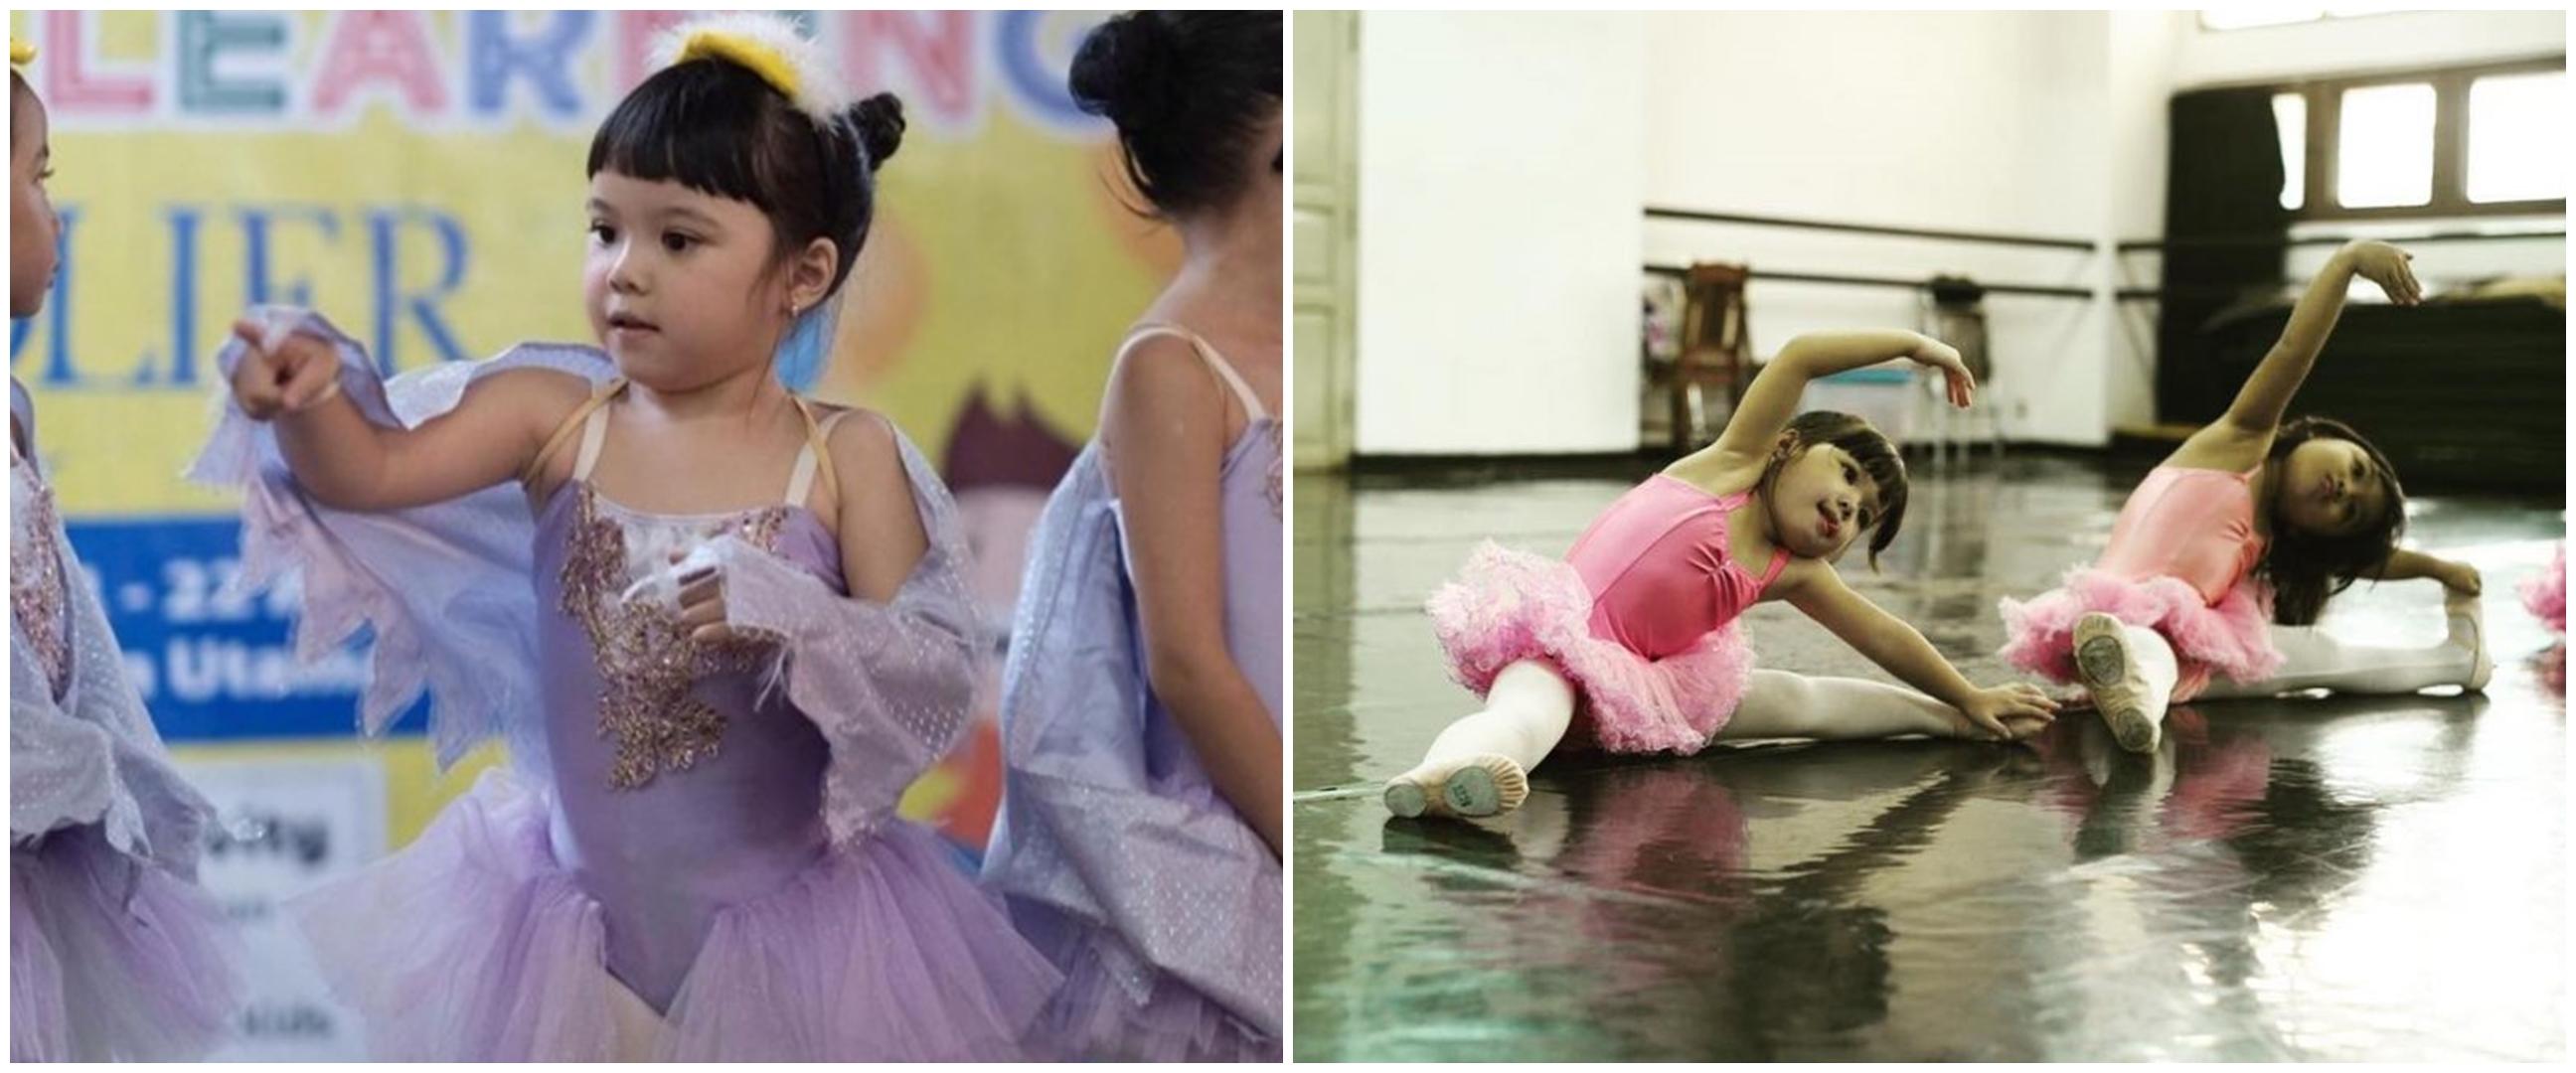 6 Potret anak seleb jadi balerina cilik, aksinya menggemaskan